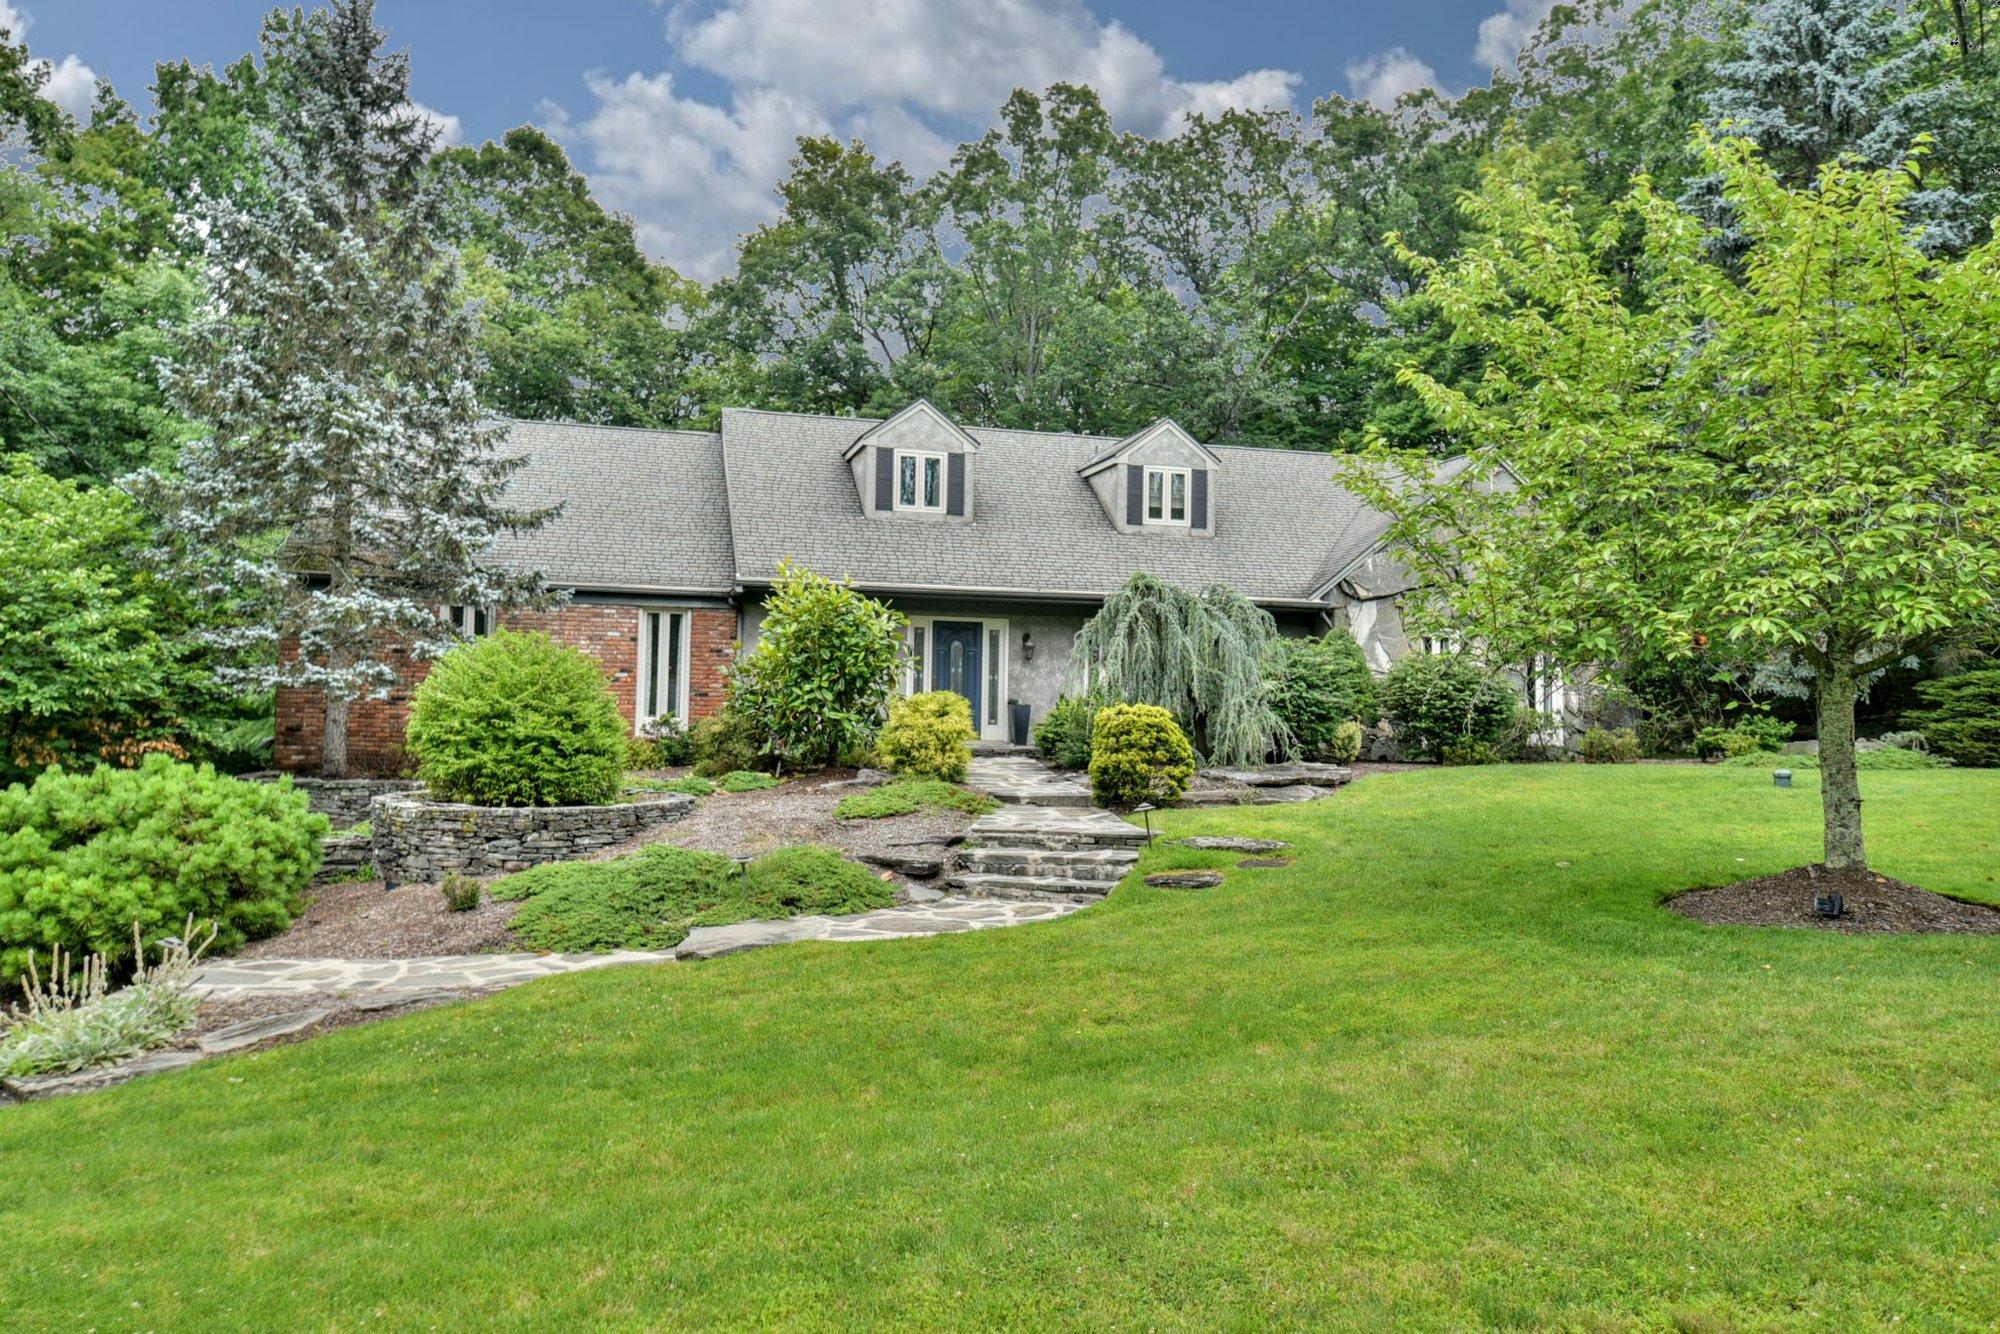 Casa a Saddle River, New Jersey, Stati Uniti 1 - 11575556